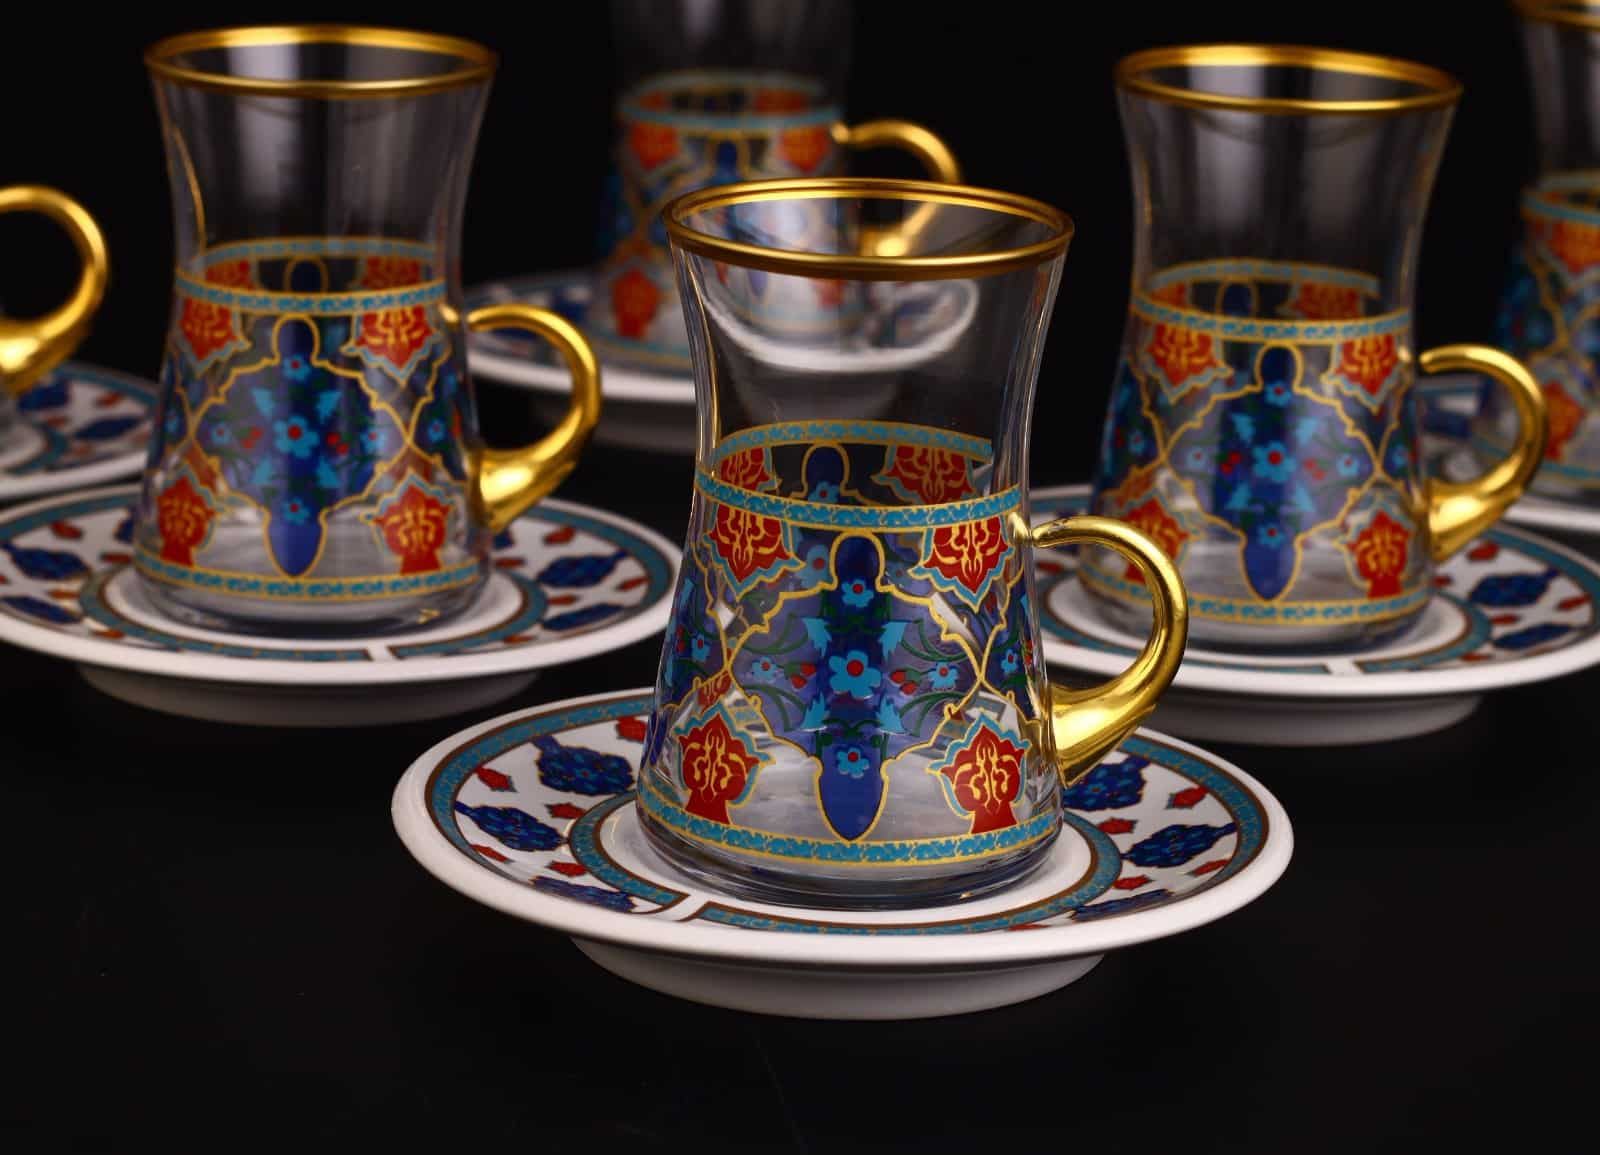 12 Pcs Turkish Tea Set With Holder Porcelain Saucers